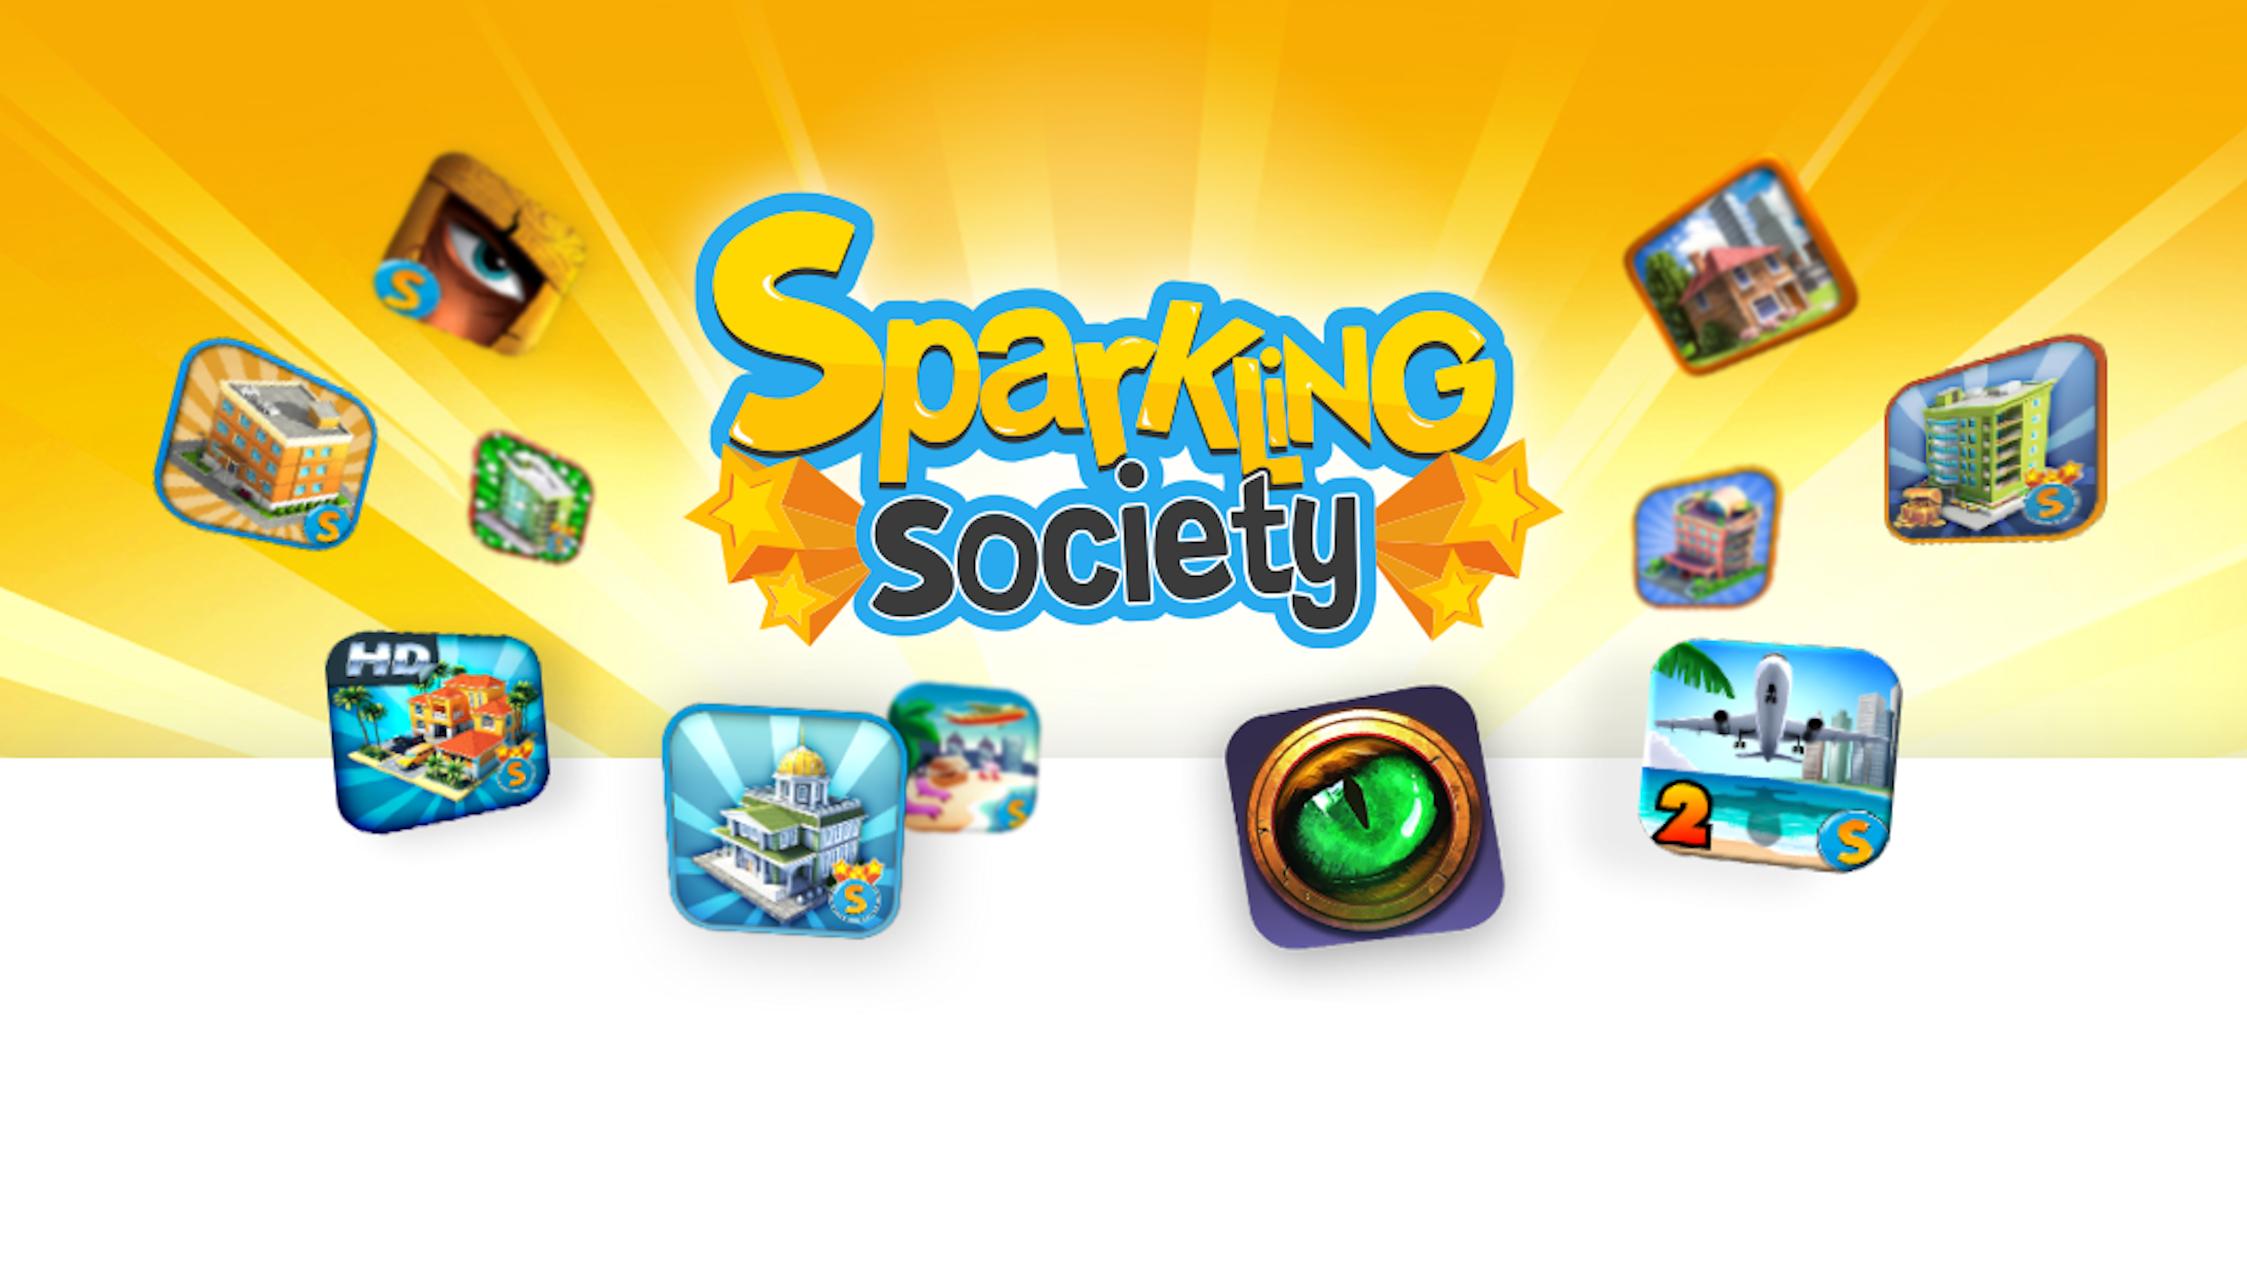 Sparkling Society Sims - Farm Town & CCG/TCG Games